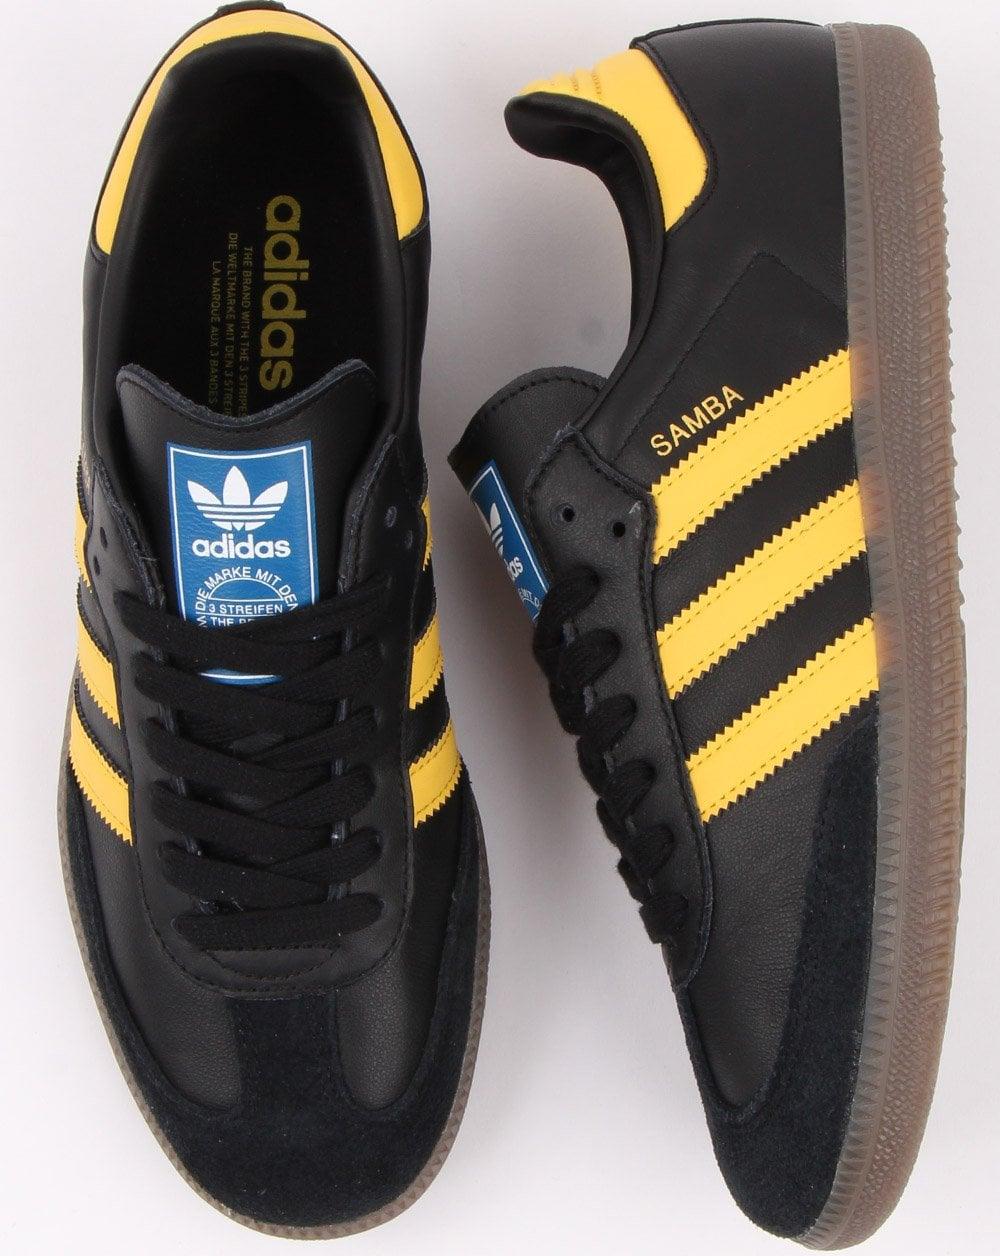 Adidas Samba Og Trainers Black/Yellow